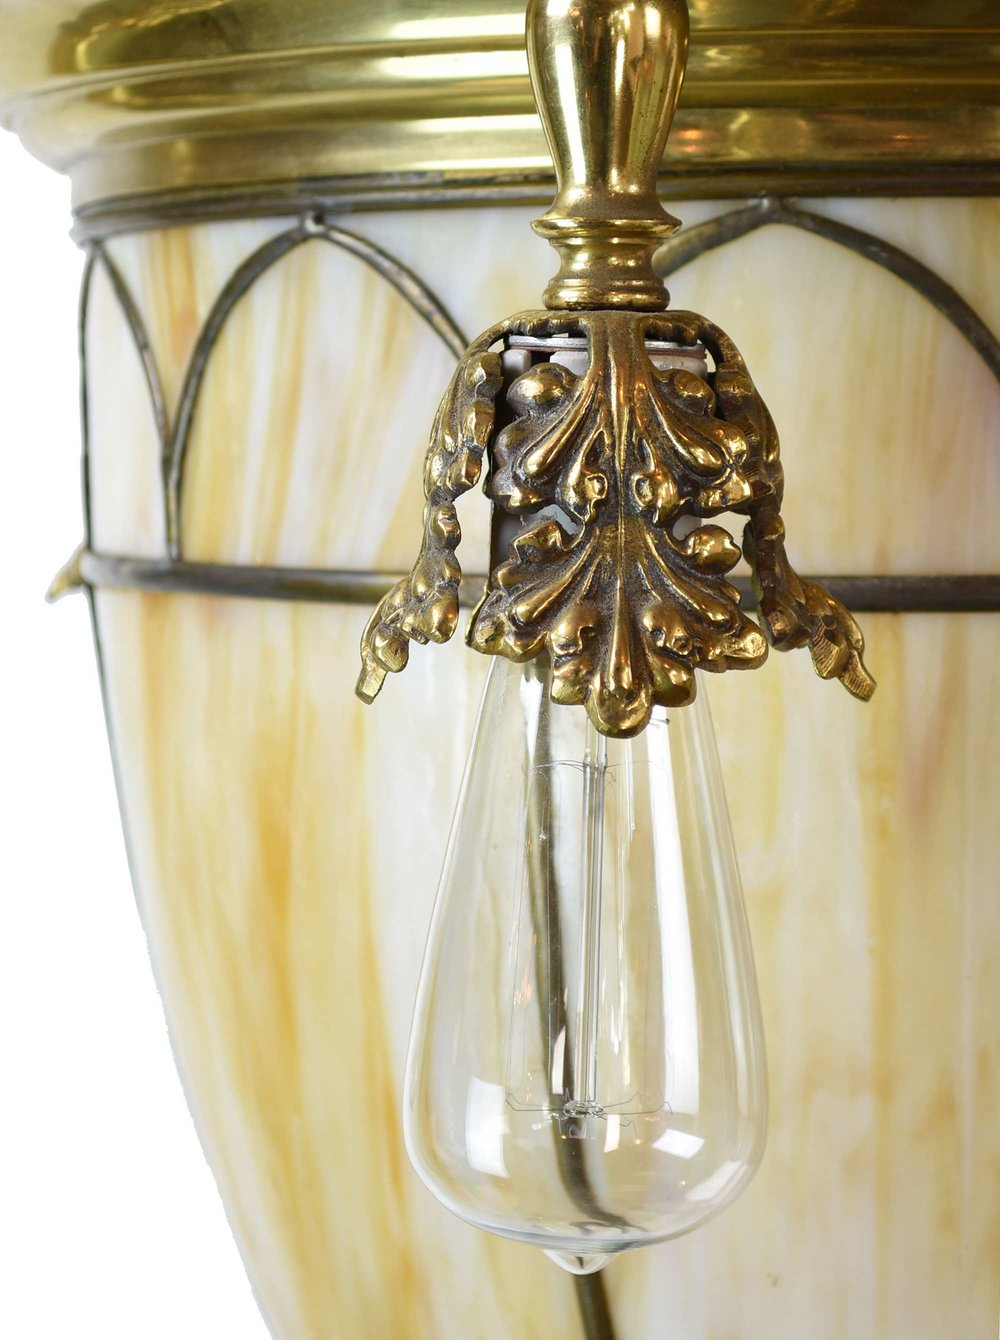 46609-6-light-brass-chandalier-with-slag-glass-shade-side.jpg